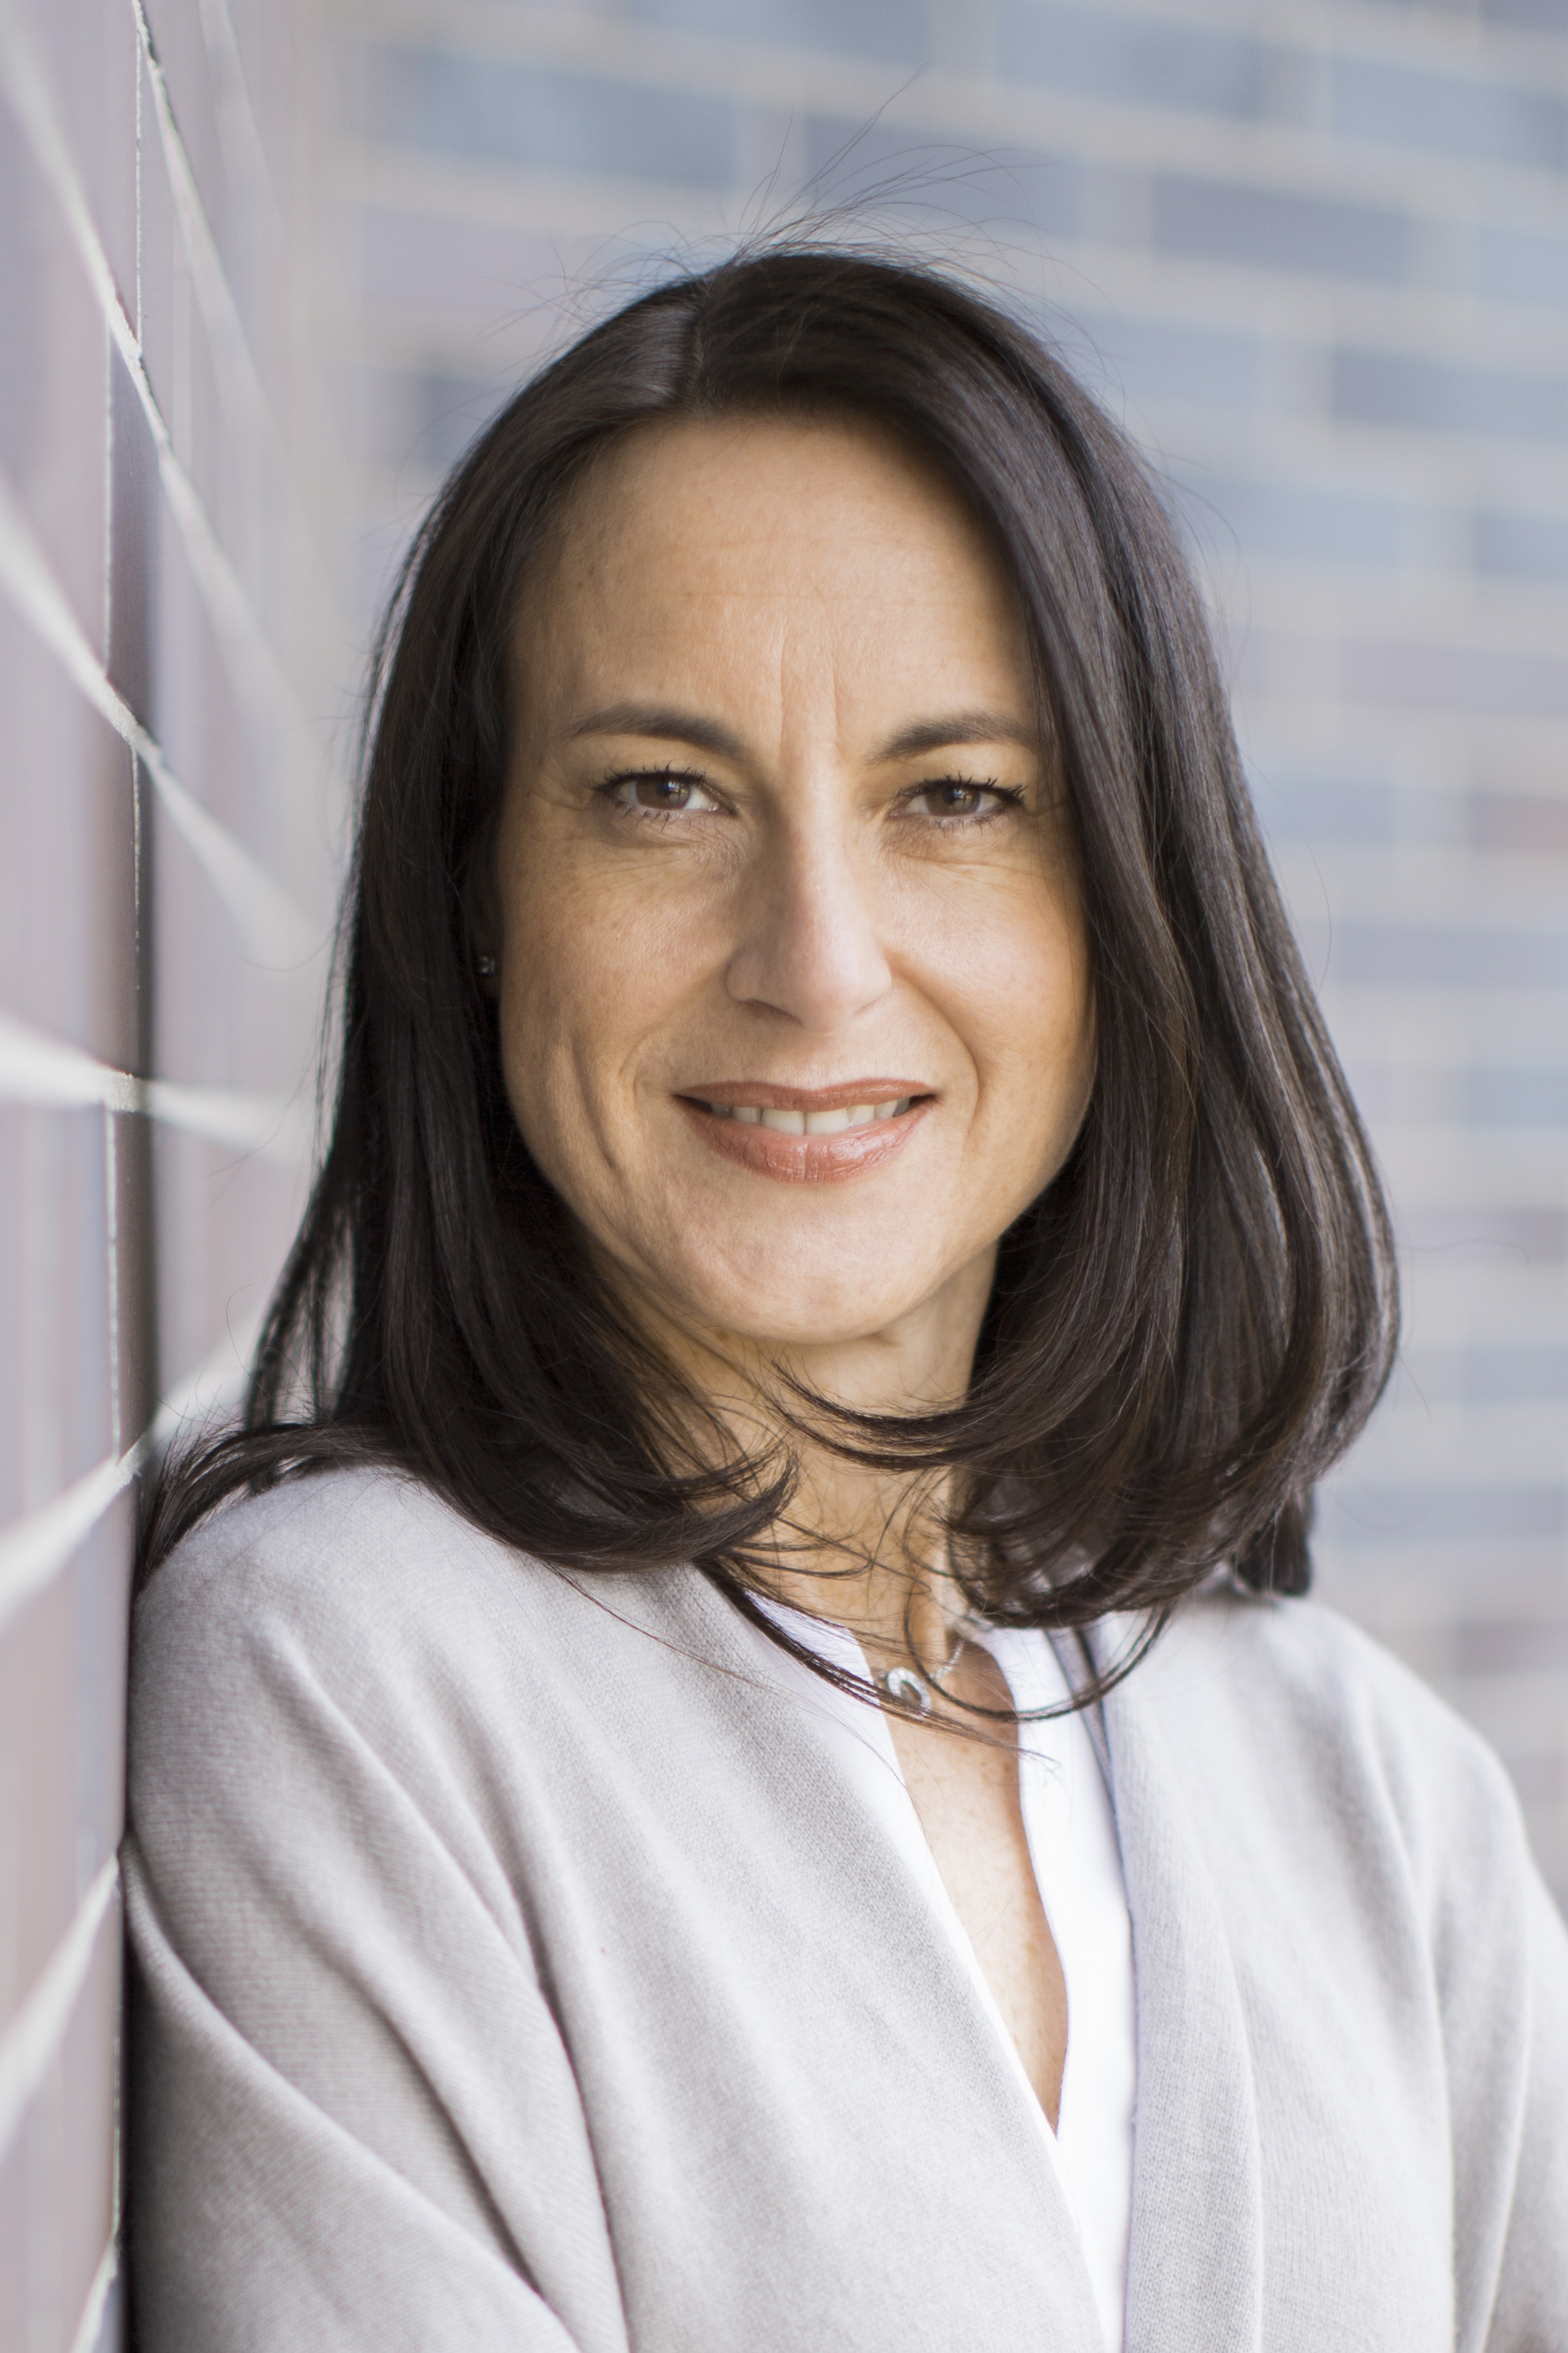 Christine Knecht-Kleber